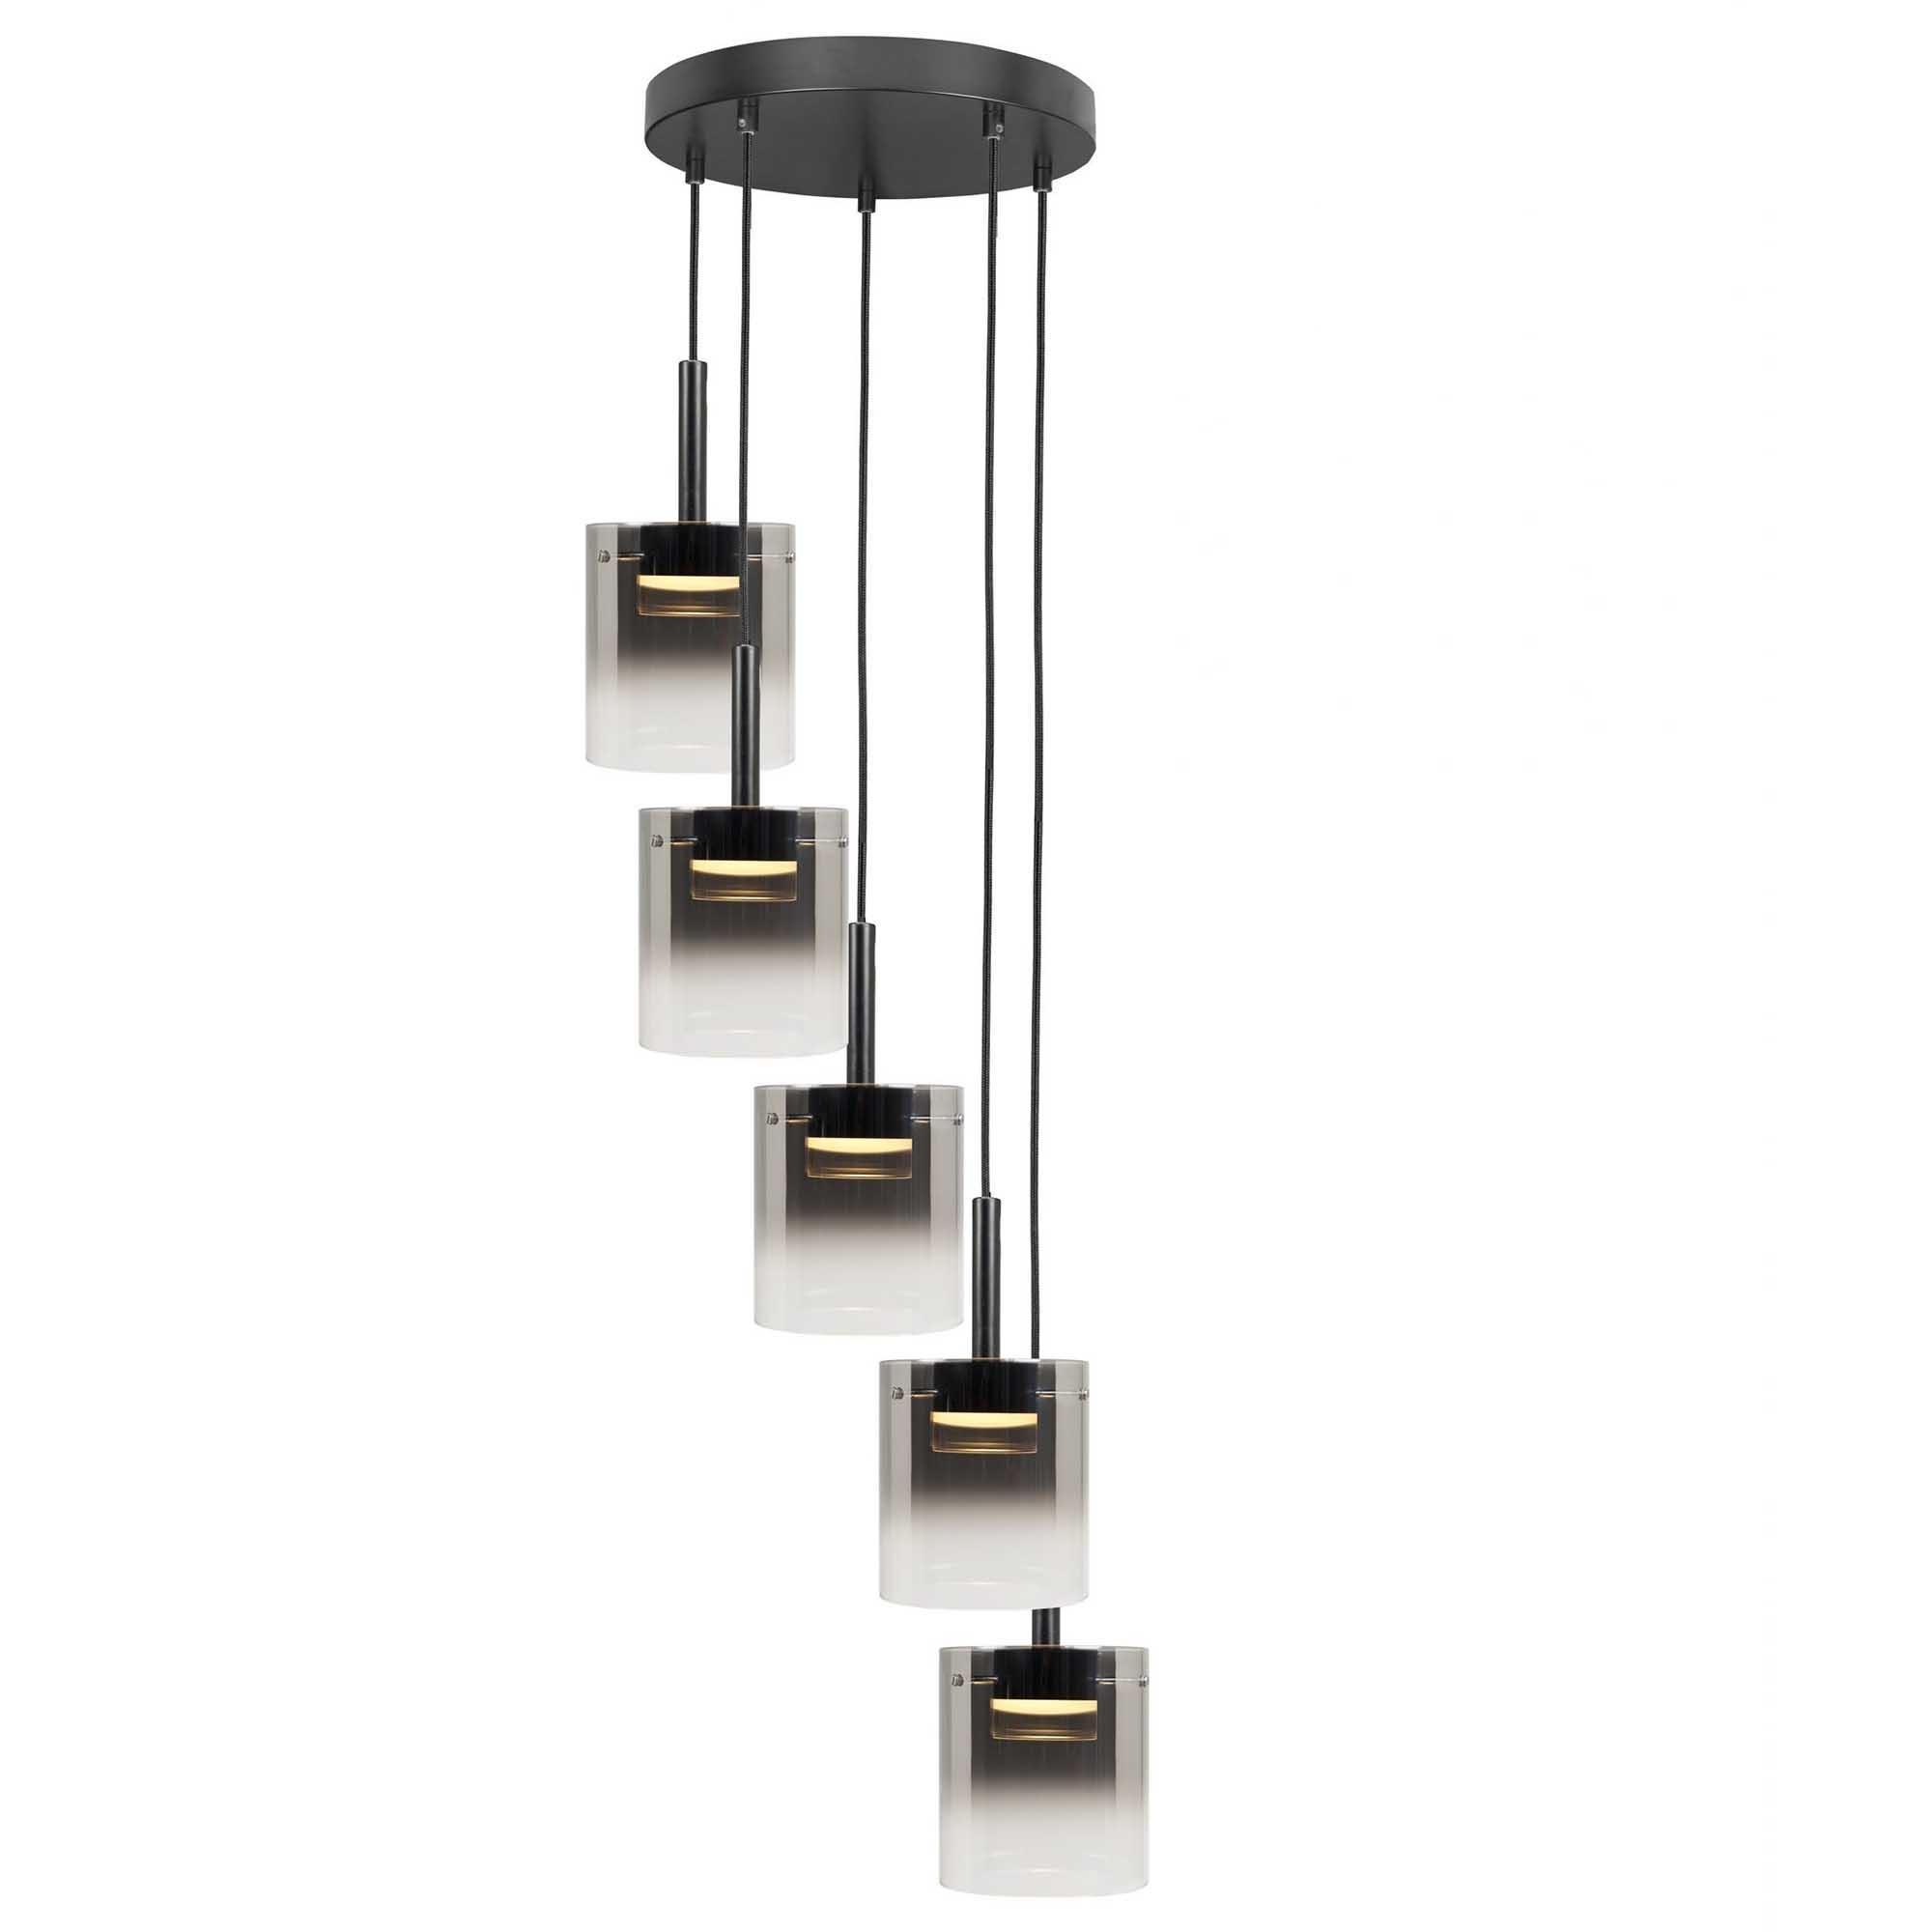 Highlight Hanglamp Salerno 5 lichts Ø 45 cm zwart